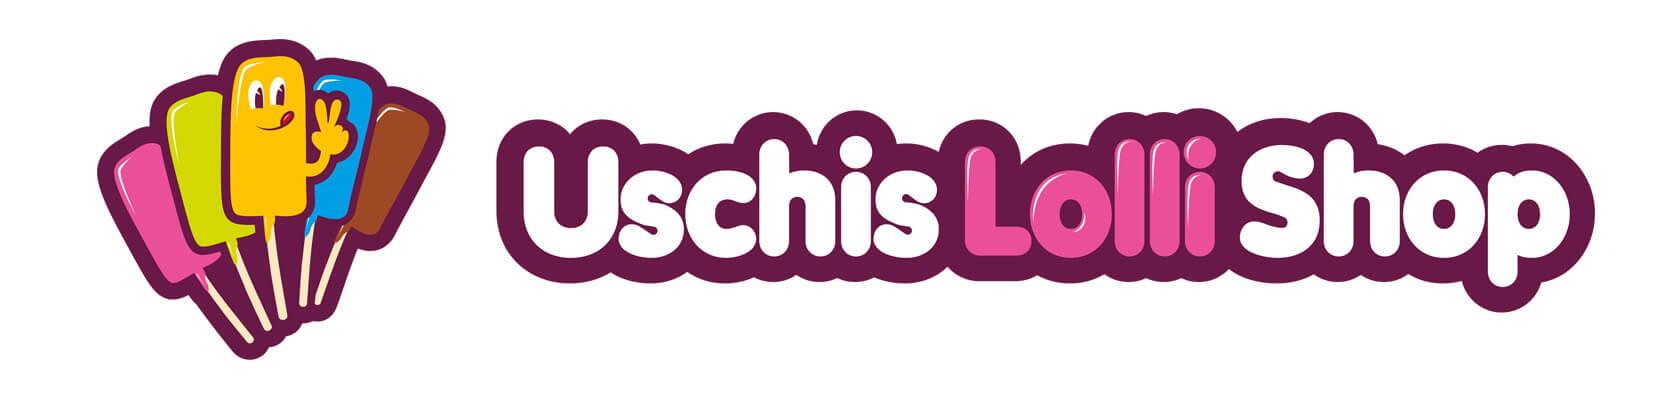 Uschis-Lolli-Shop Etzy Banner quer